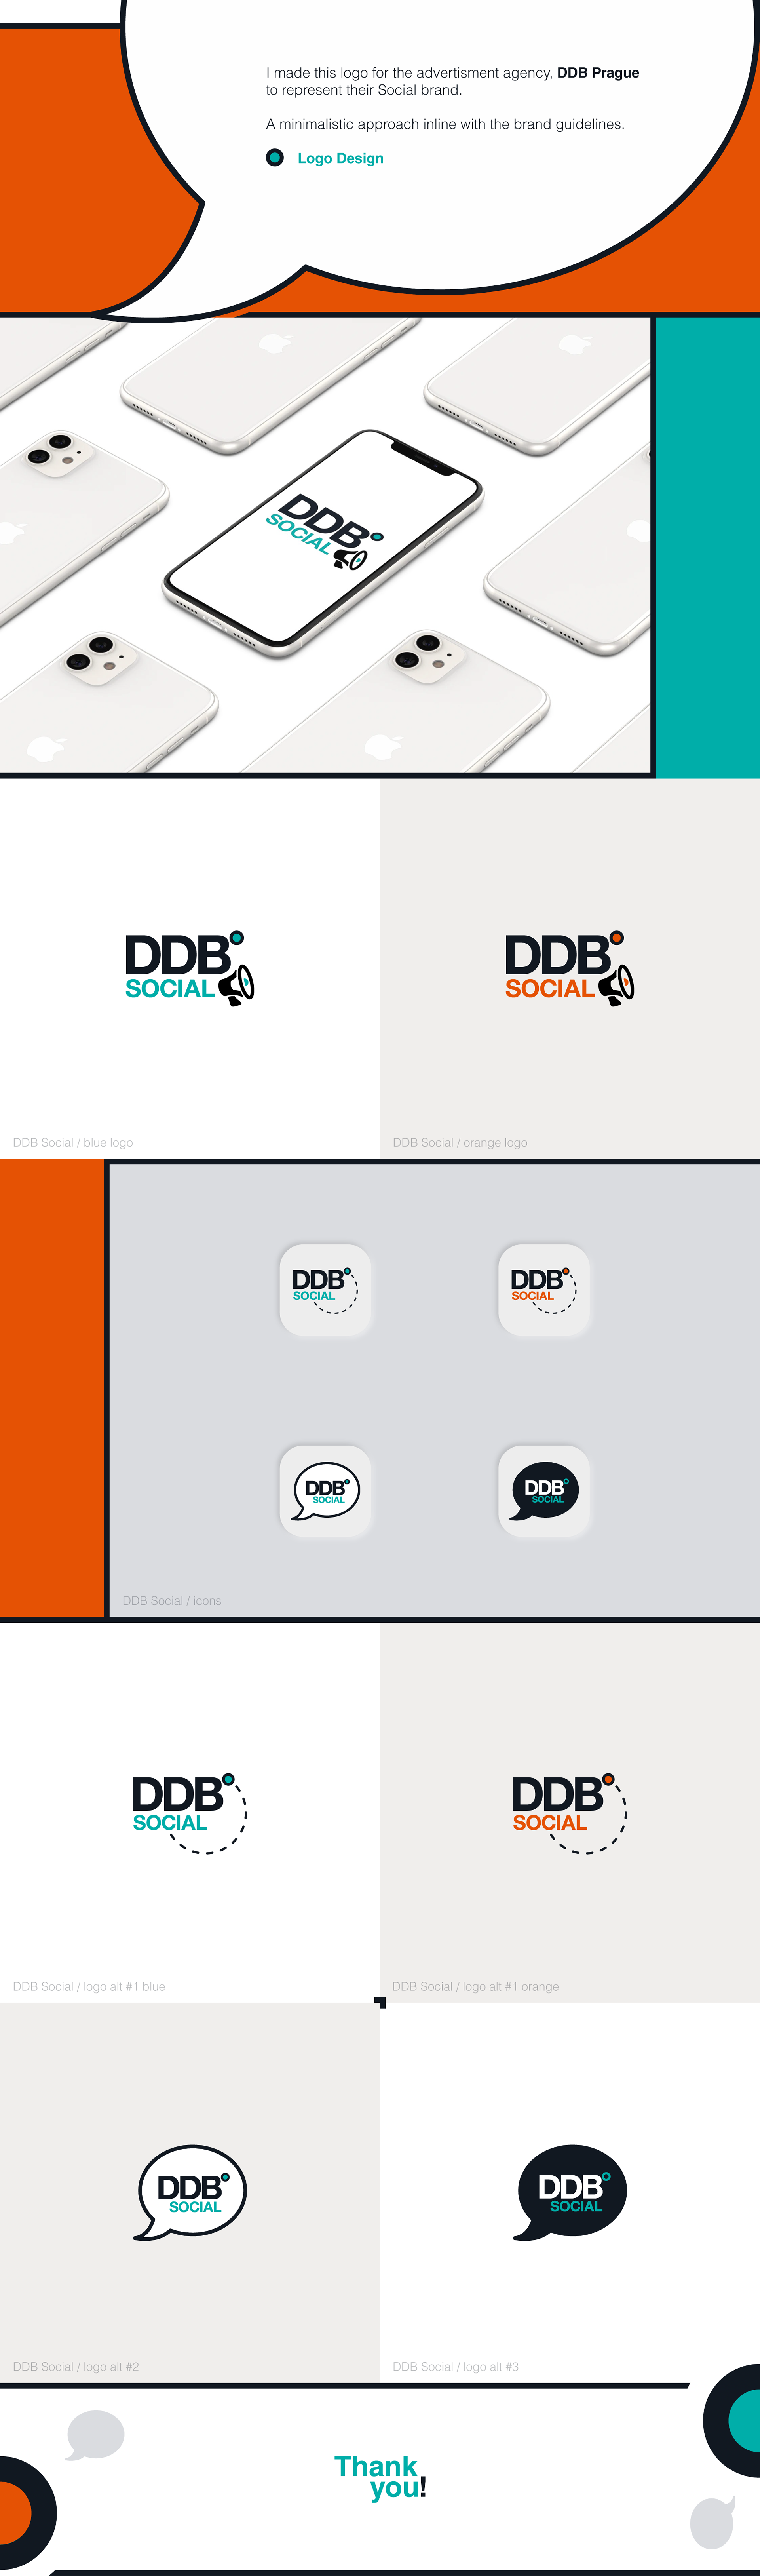 DDB Social - Project #2